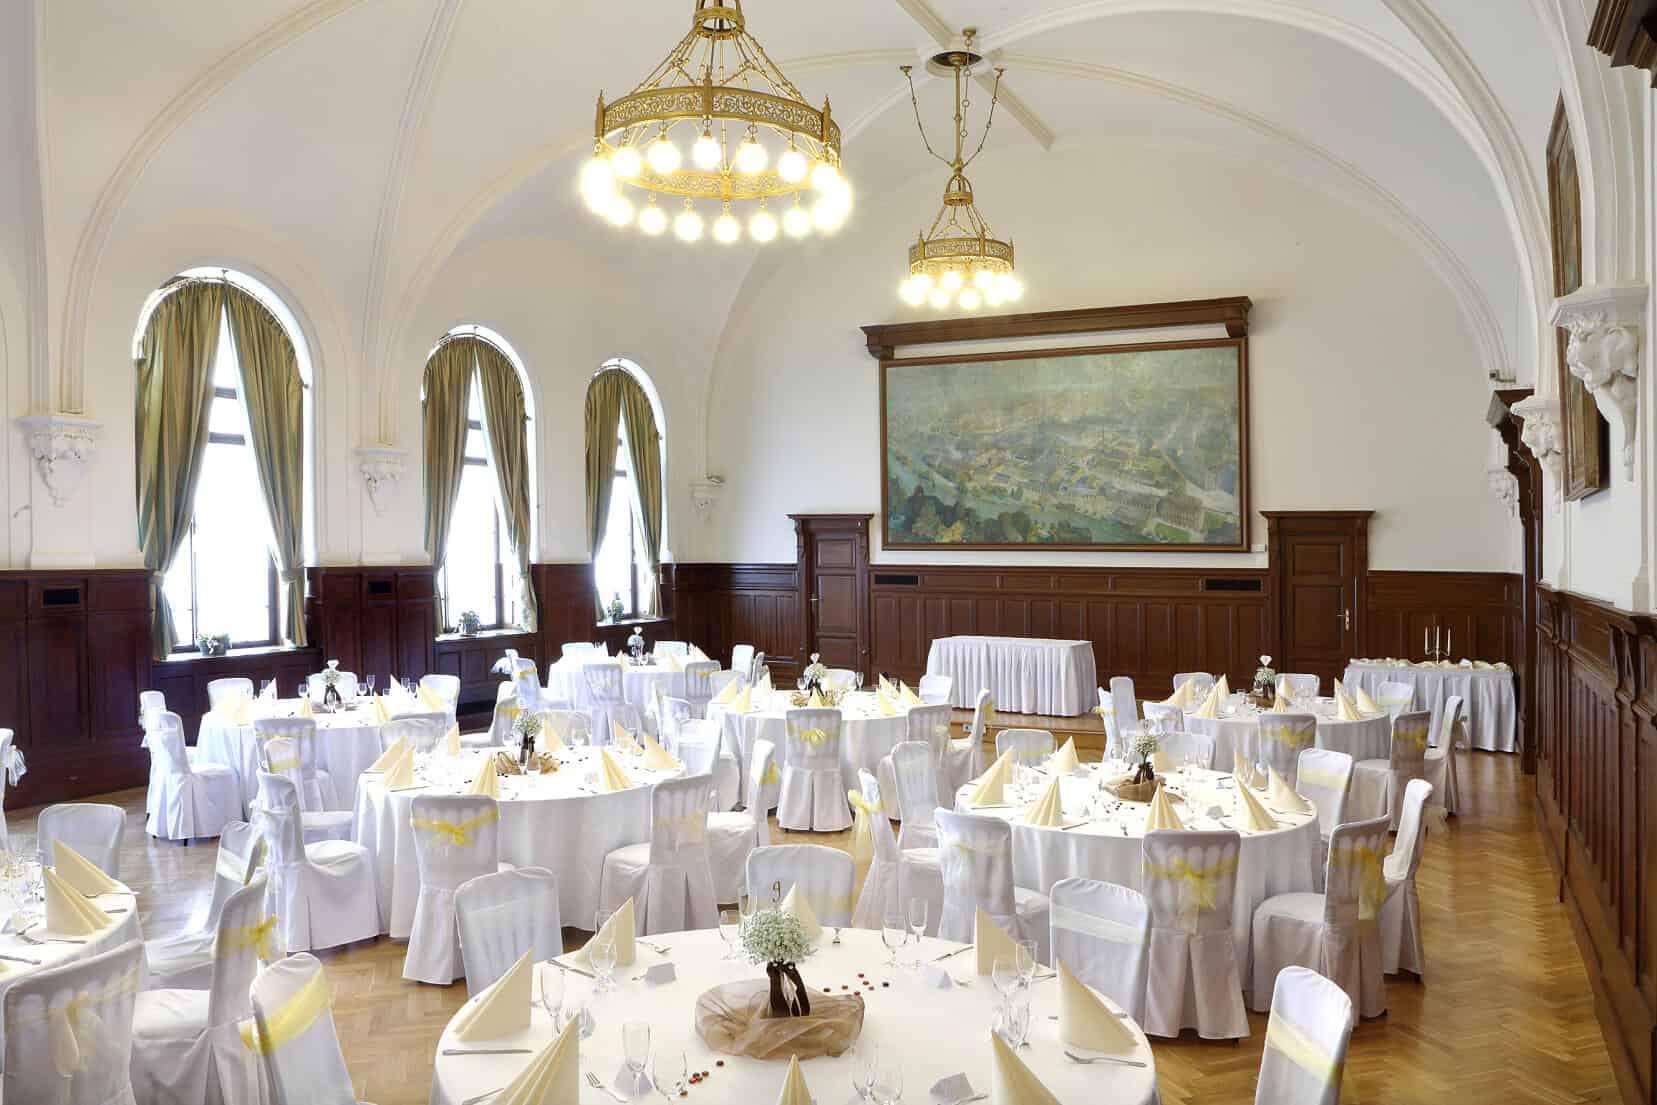 Svatební tabule - Sál Pilsner Urqulle